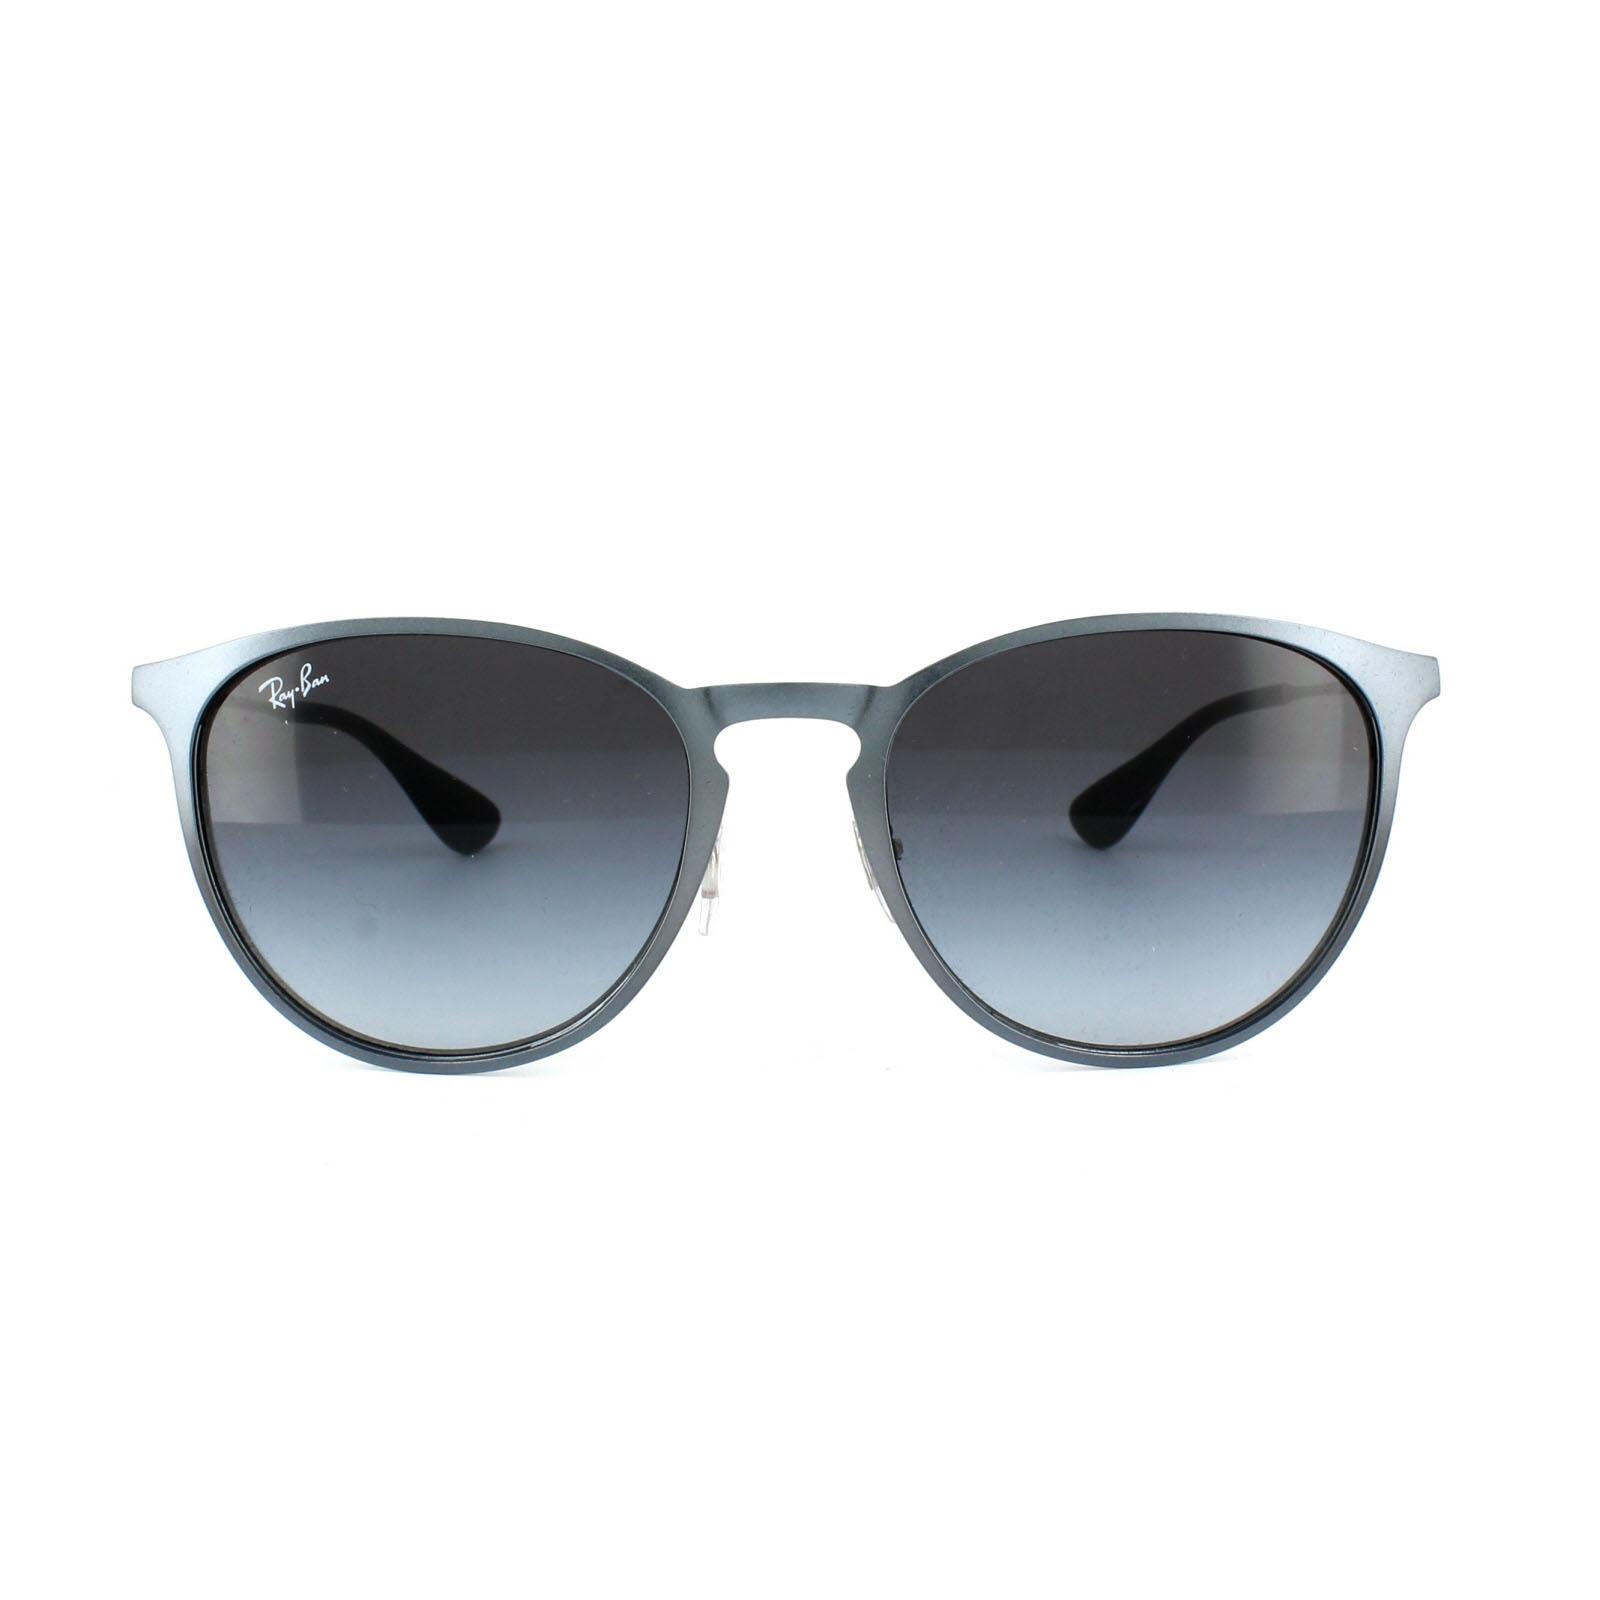 87a4ffcb14 Cheap Ray-Ban Erika Metal 3539 Sunglasses - Discounted Sunglasses